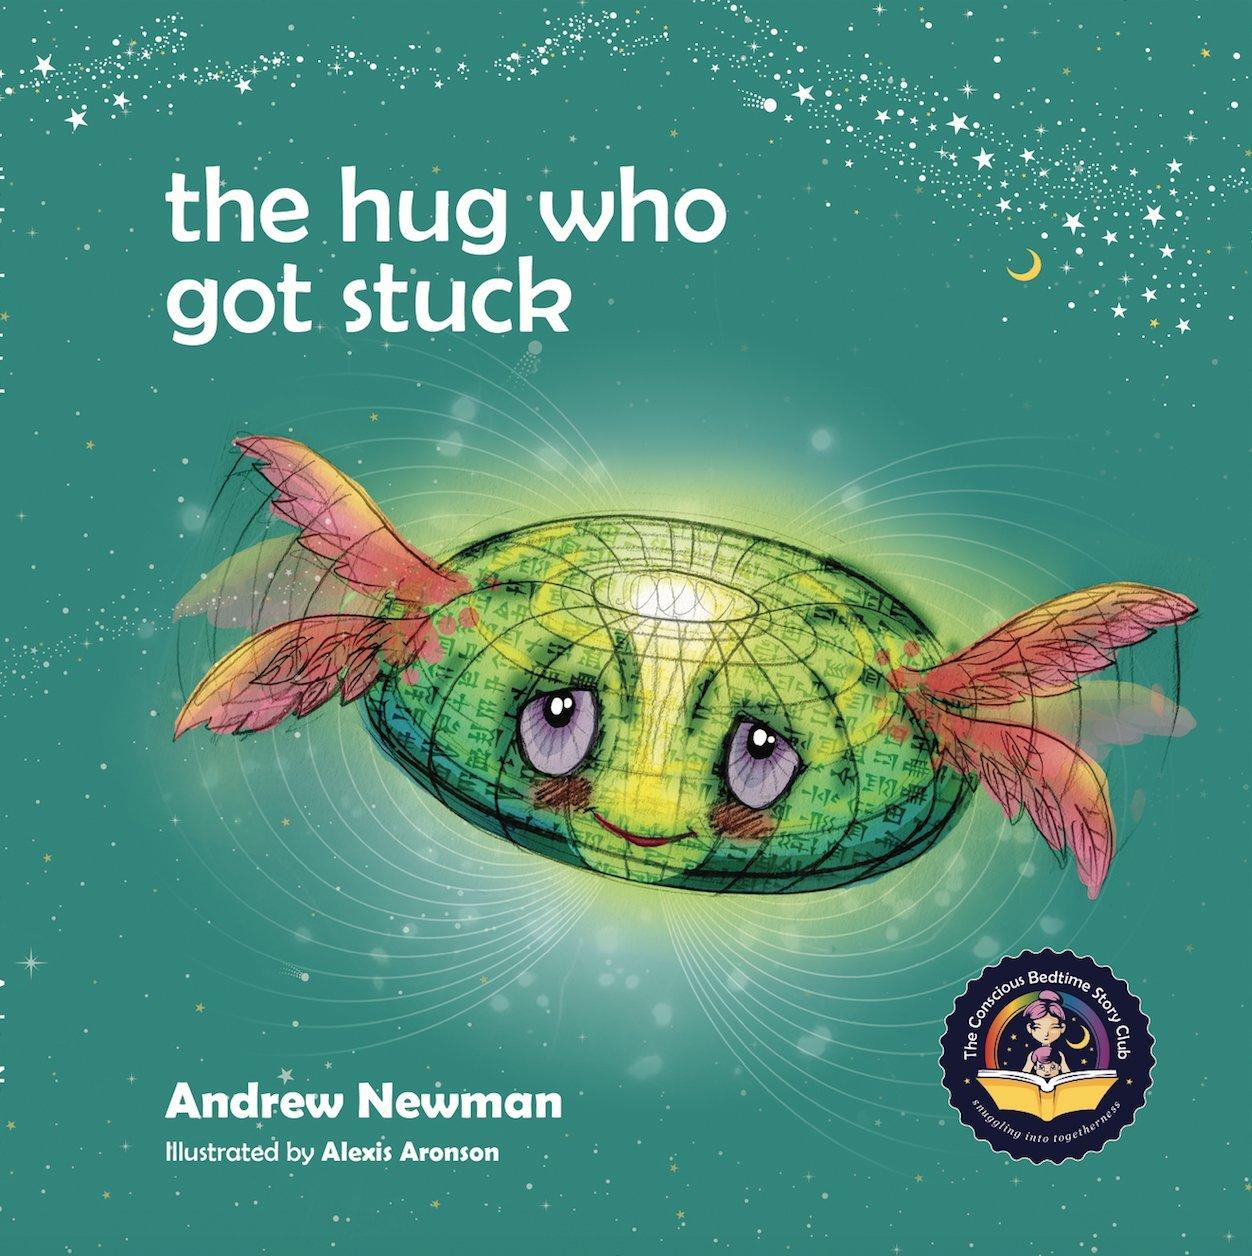 Read Online Hug Who Got Stuck (The) PDF